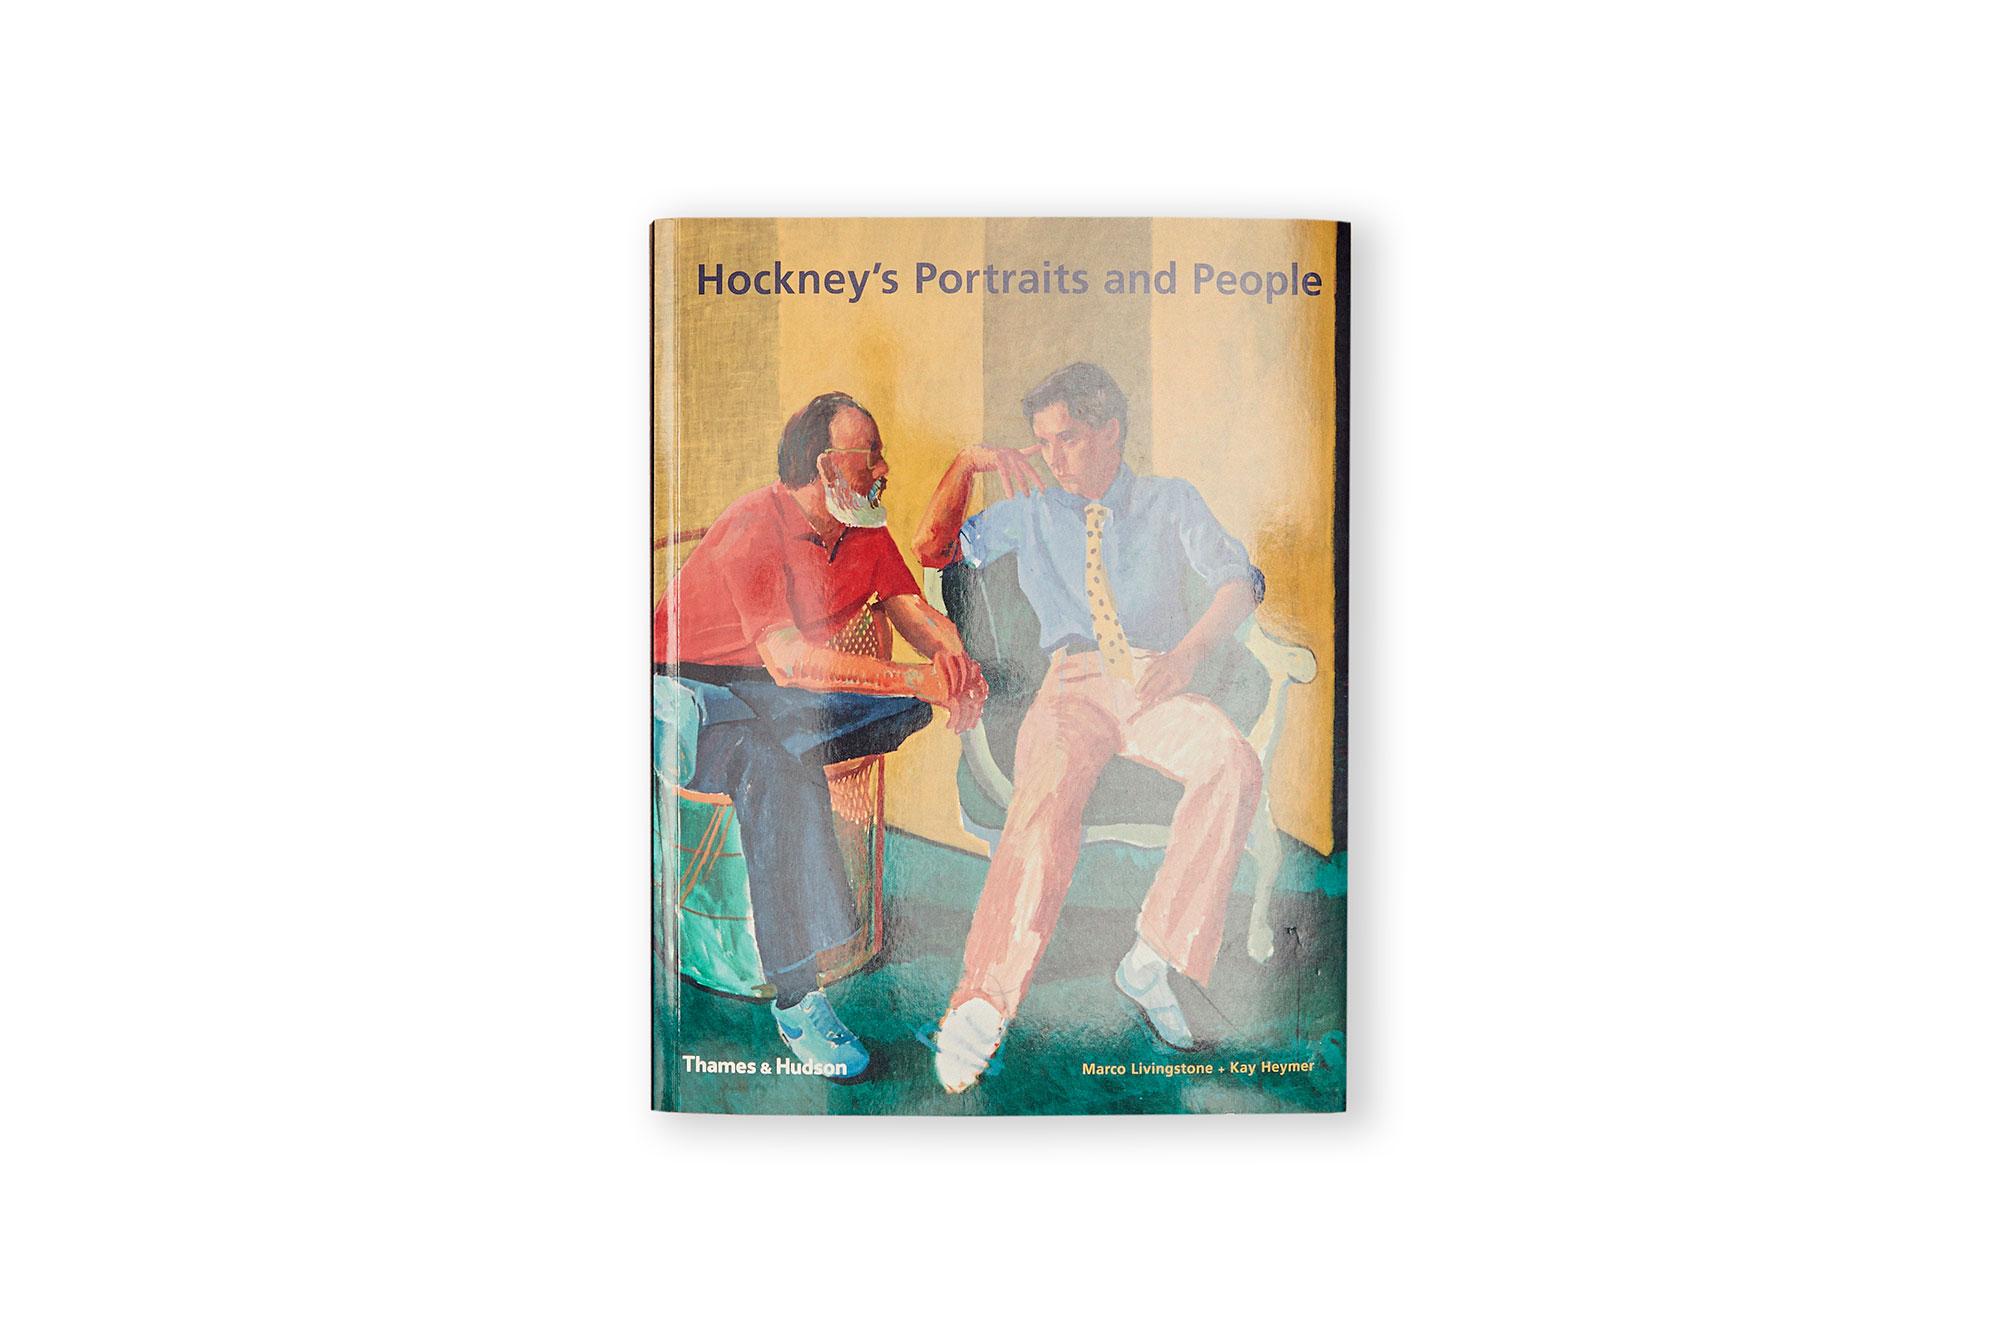 HOCKNEY'S PORTRAITS AND PEOPLE, david hockney.